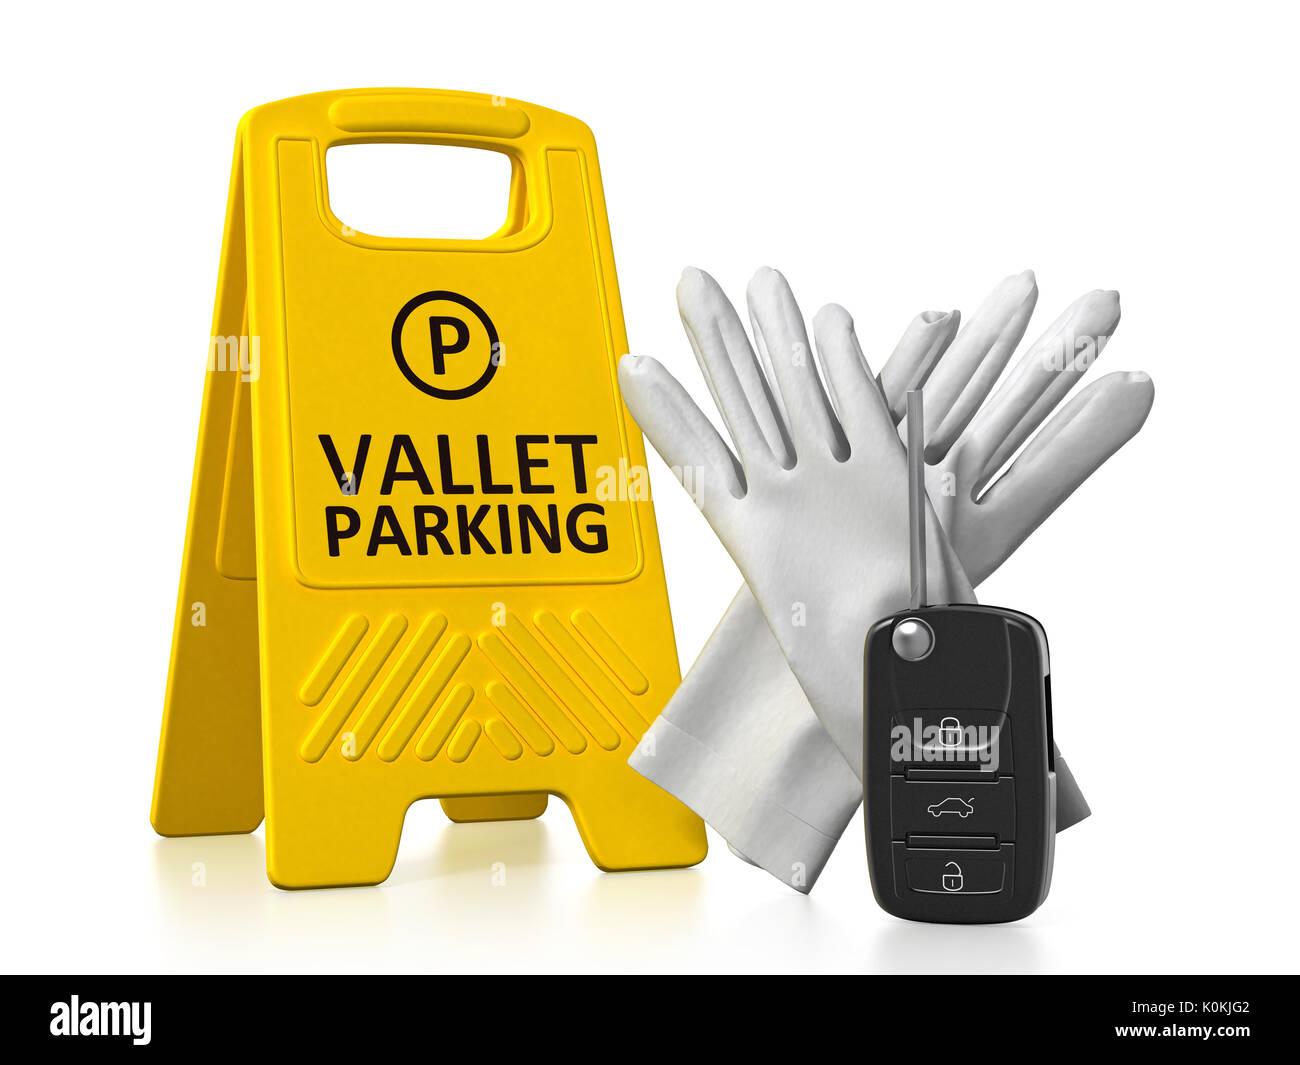 Car Wash Tysons Corner Mall Parking Garage